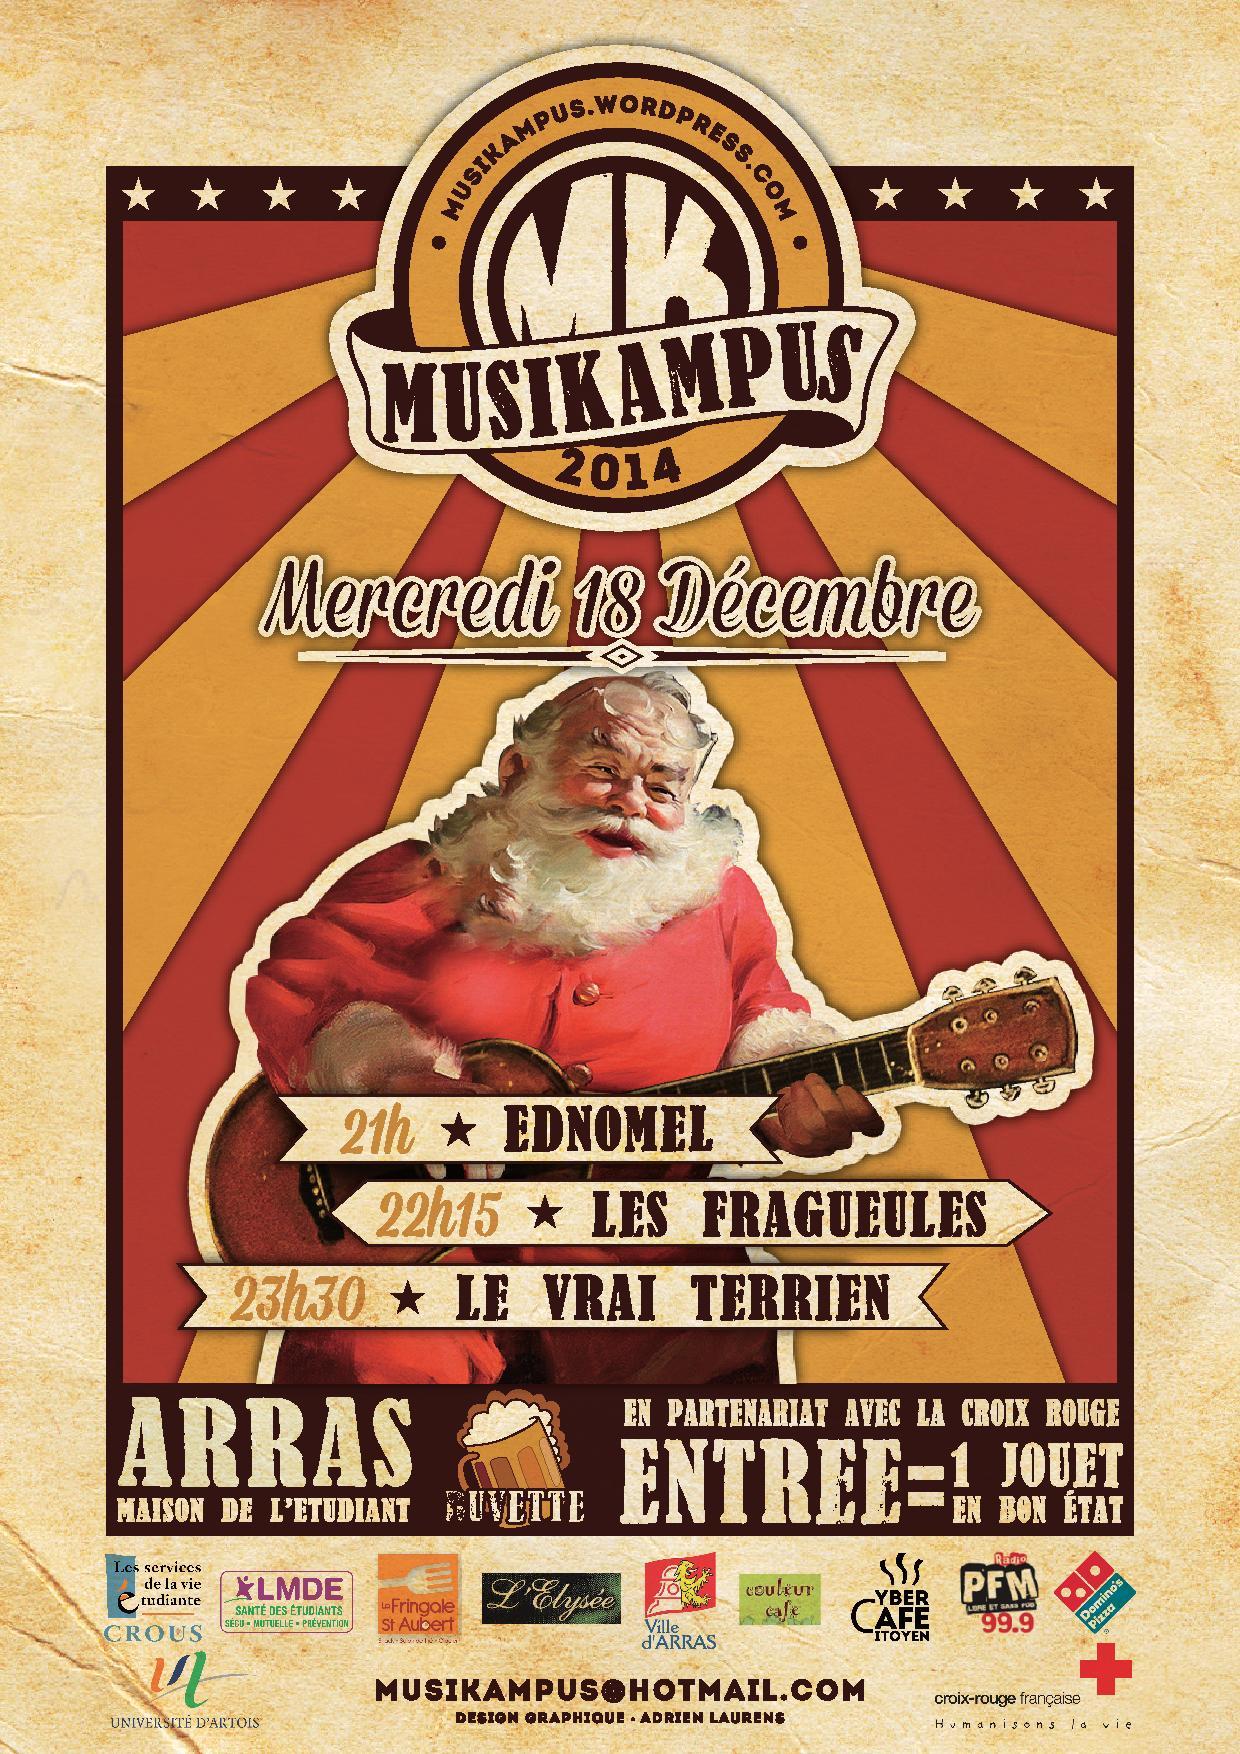 affiche noel musikampus   Concert de Noël Musikampus